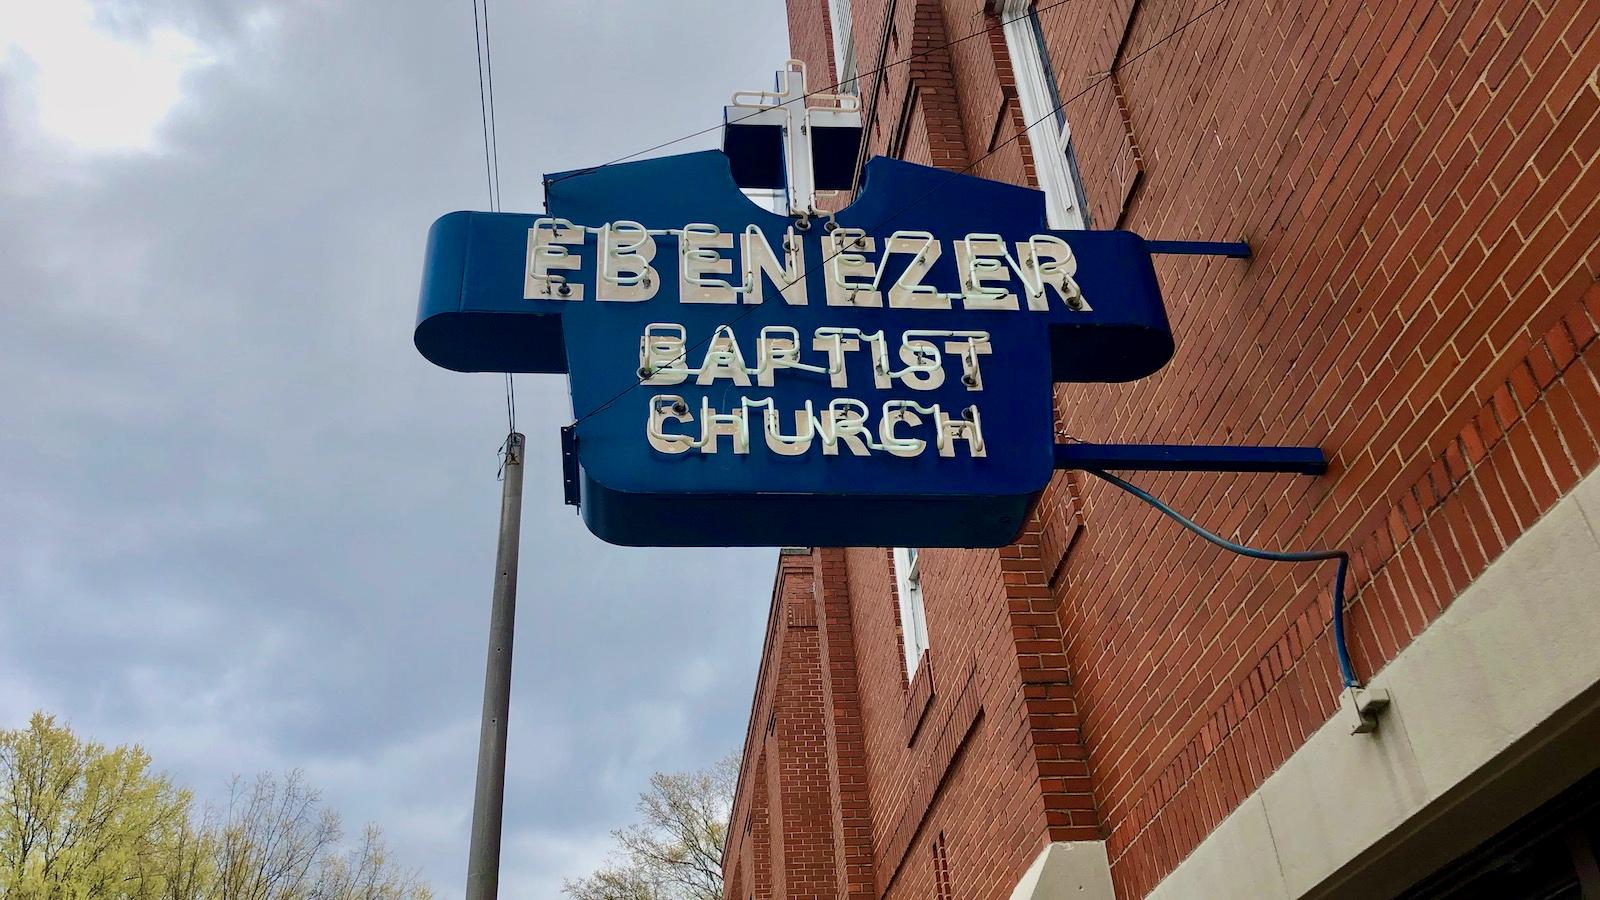 Ebenezer Baptist Church sign